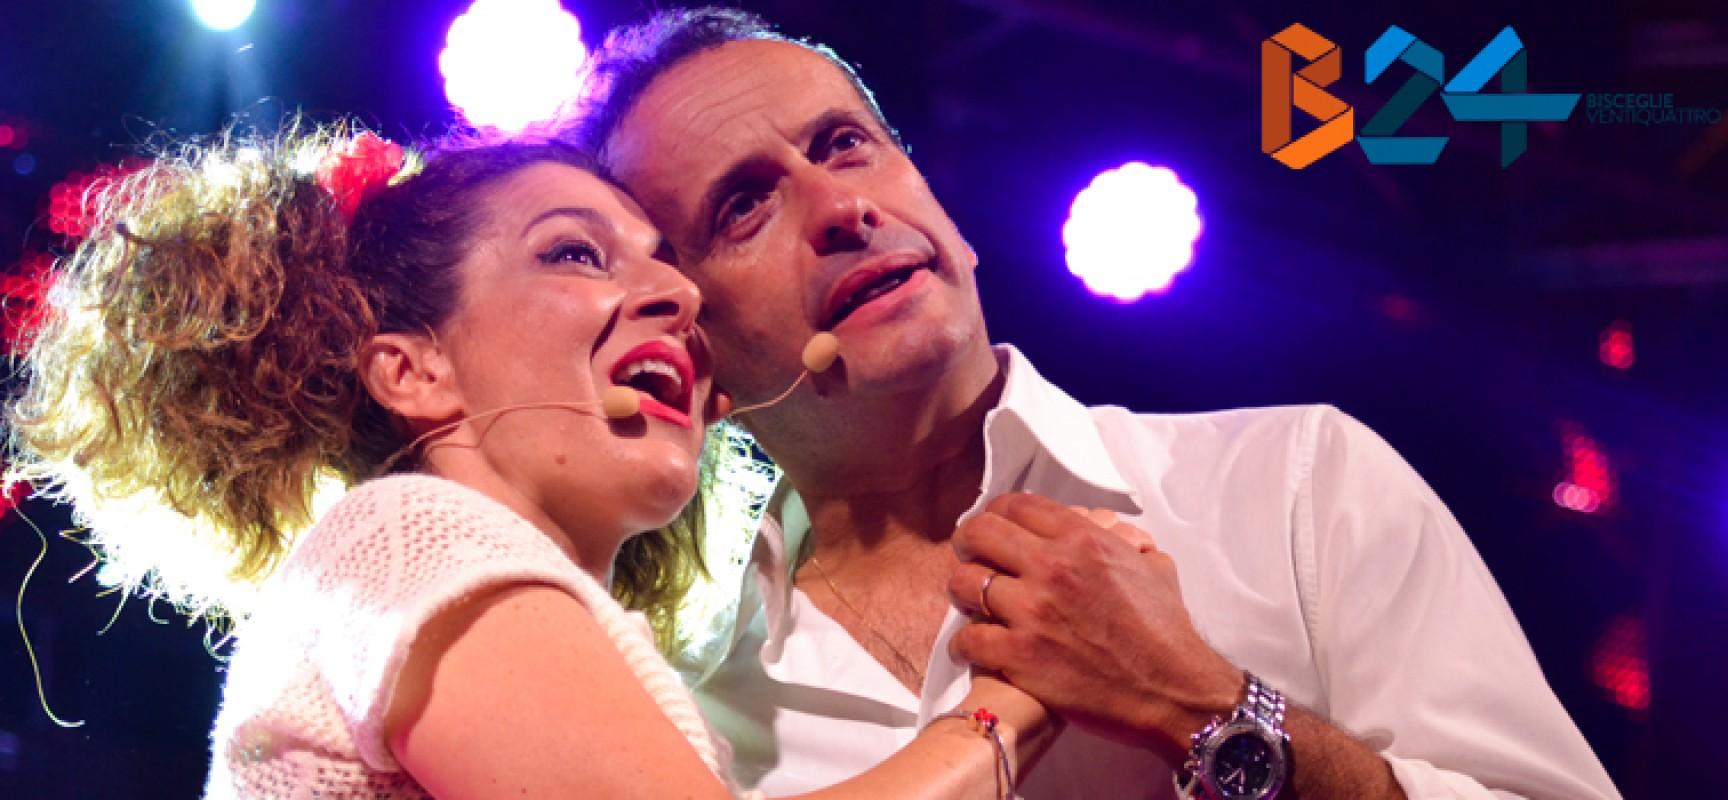 Stasera Uccio De Santis al teatro Mediterraneo racconta 15 anni di Mudù